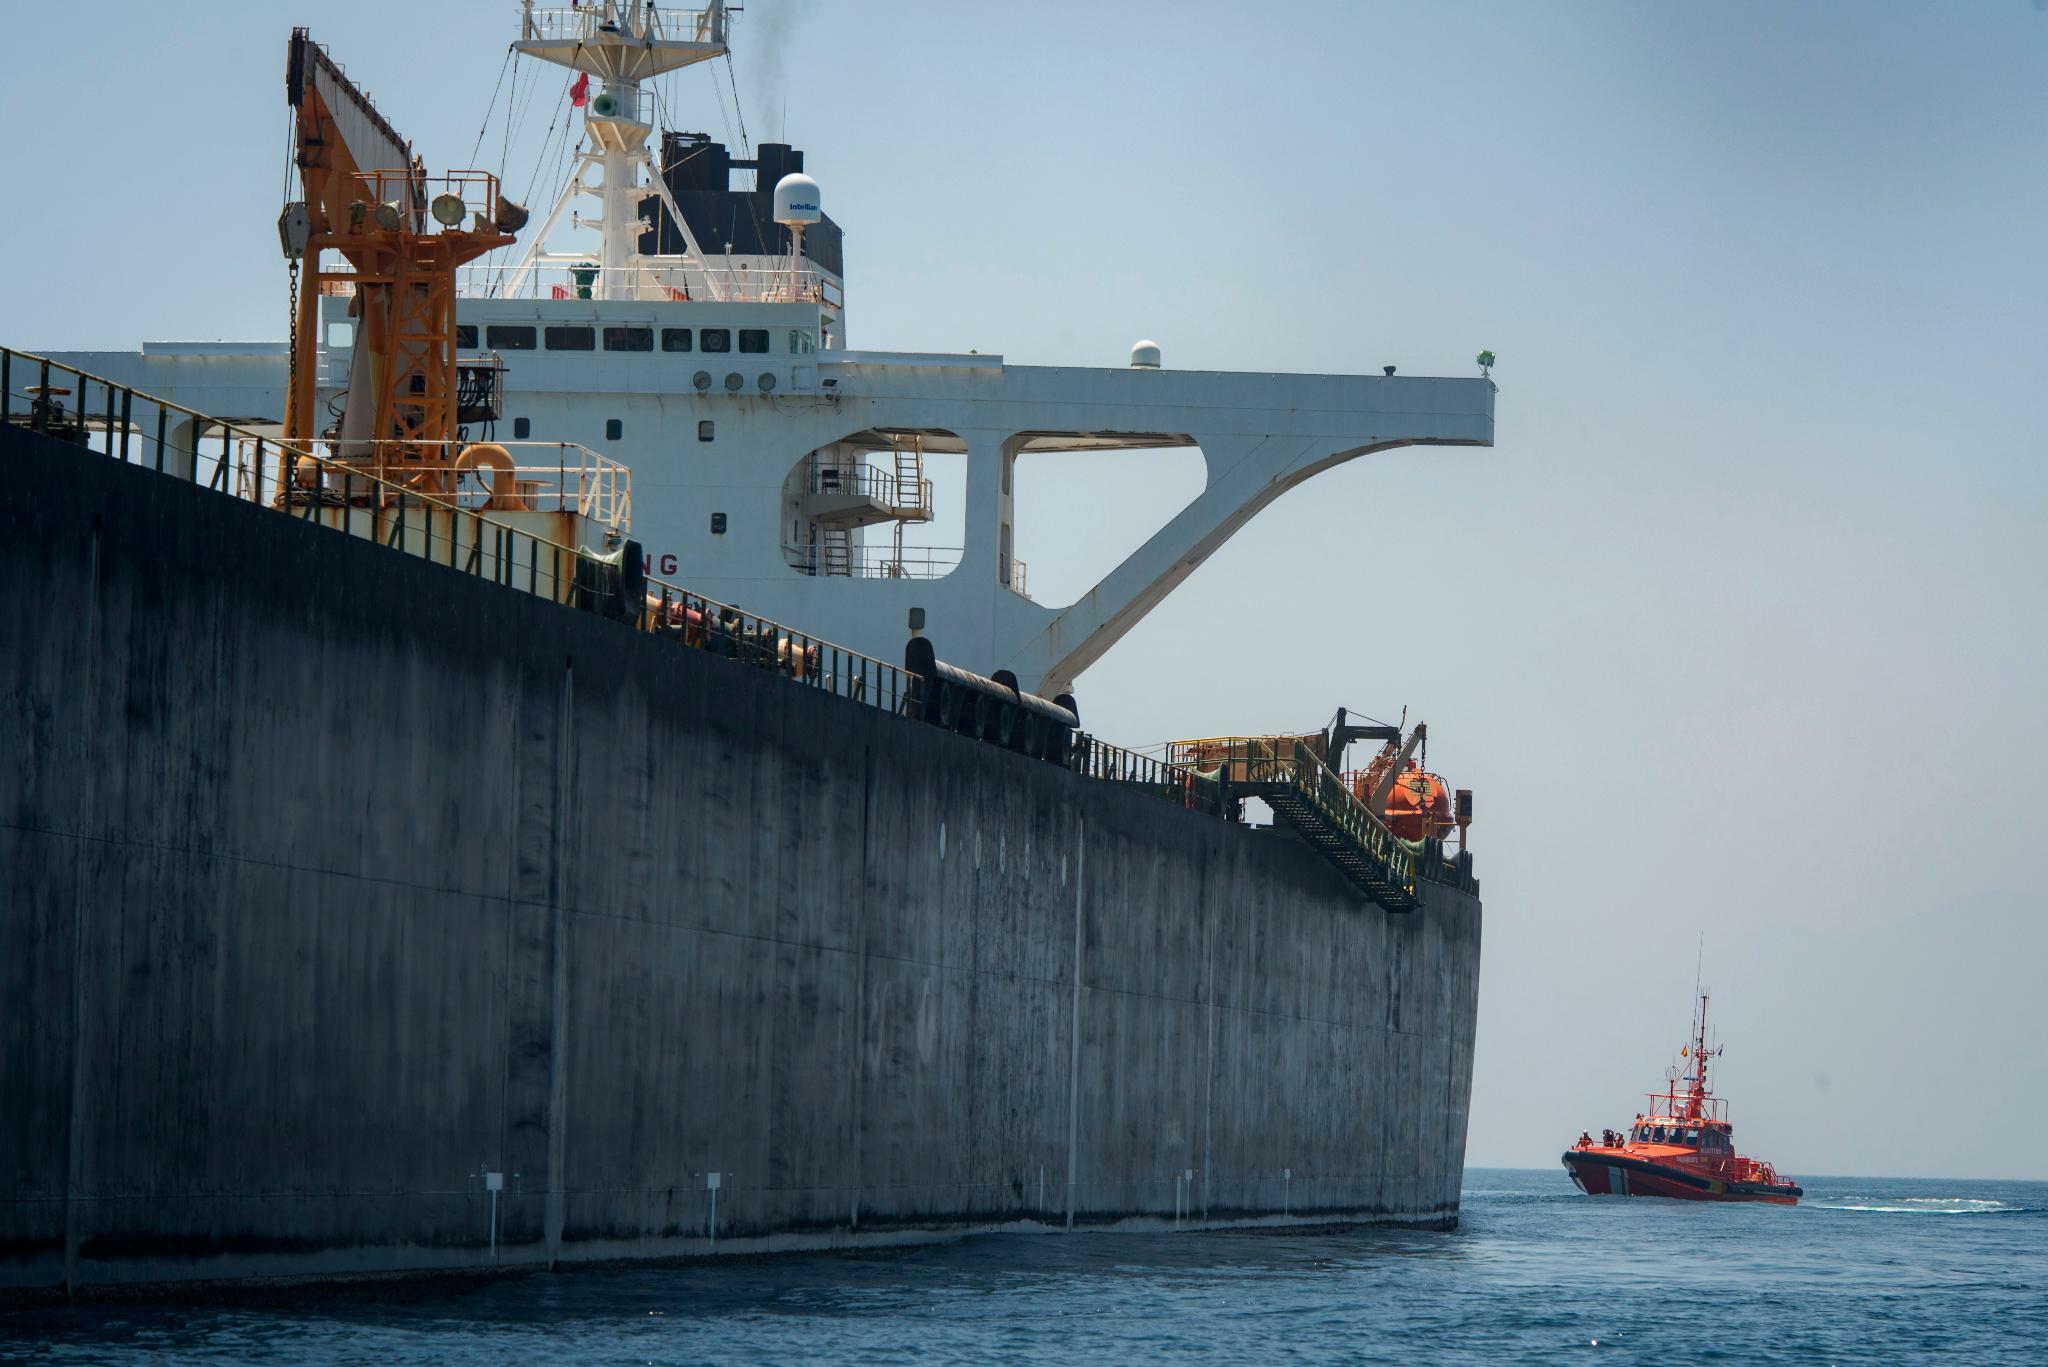 Iranischer Tanker soll Gibraltar trotz US-Anordnung verlassen